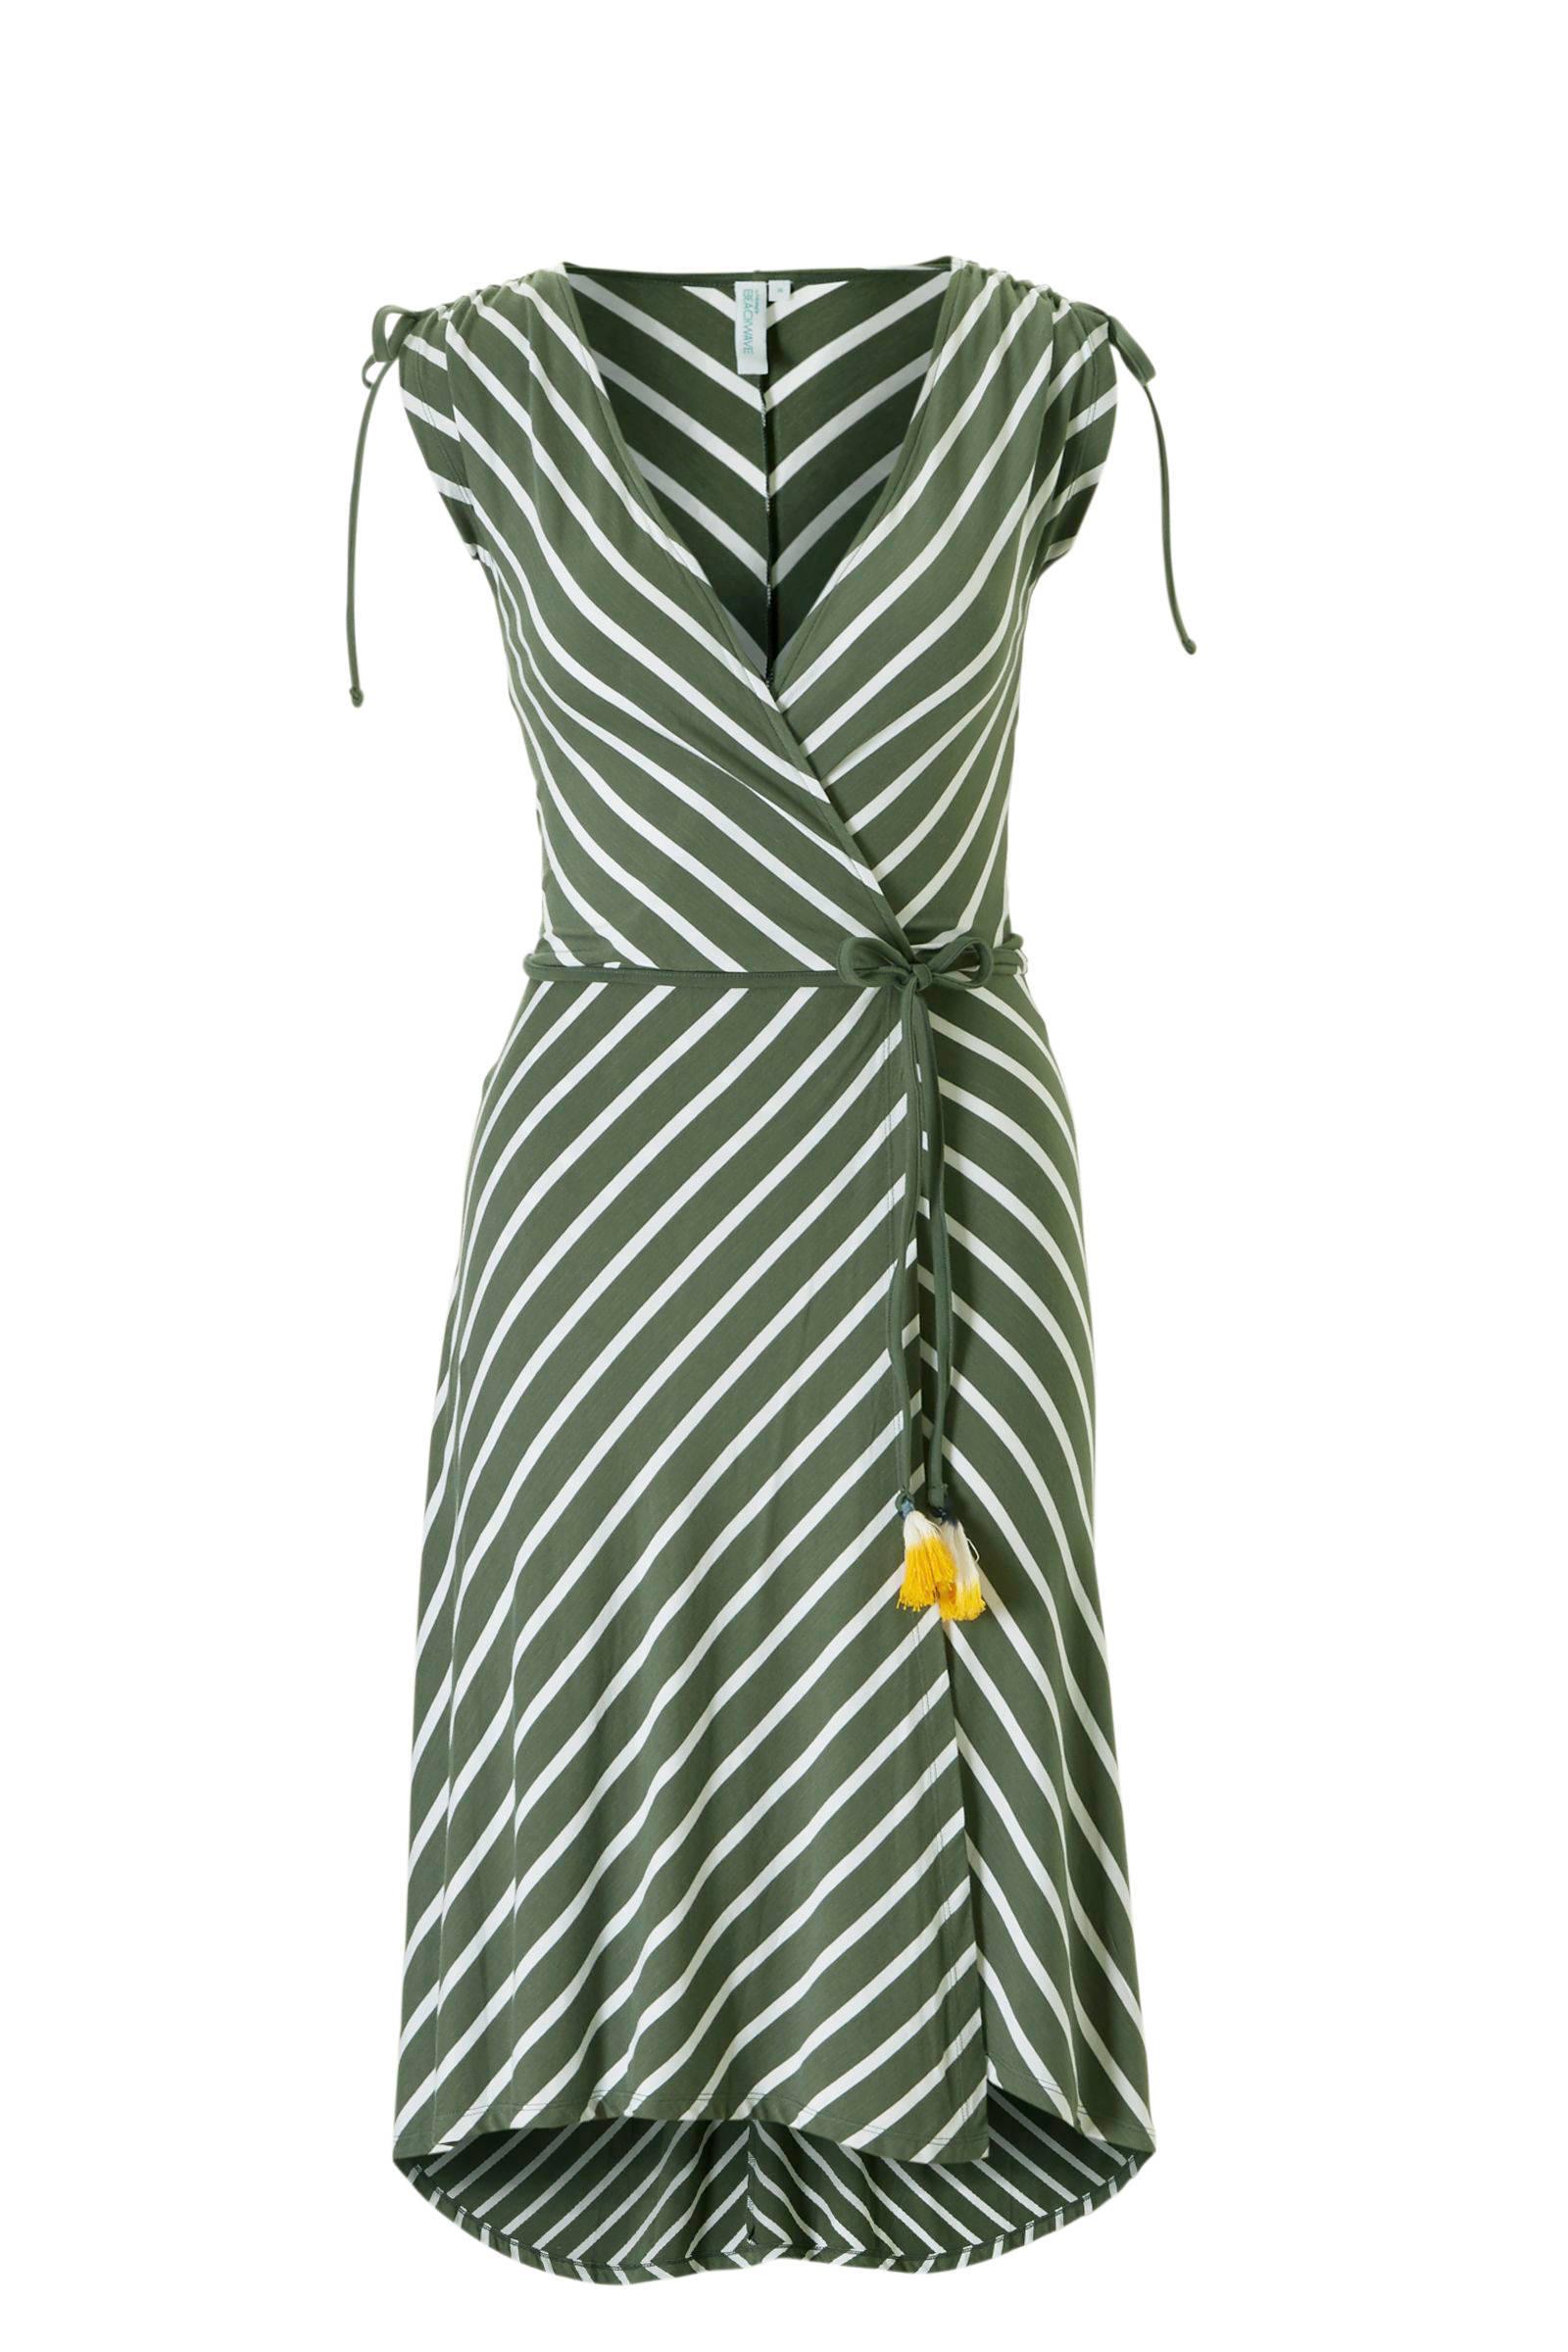 70c8967ee83e5a whkmp s beachwave wikkel-look jurk